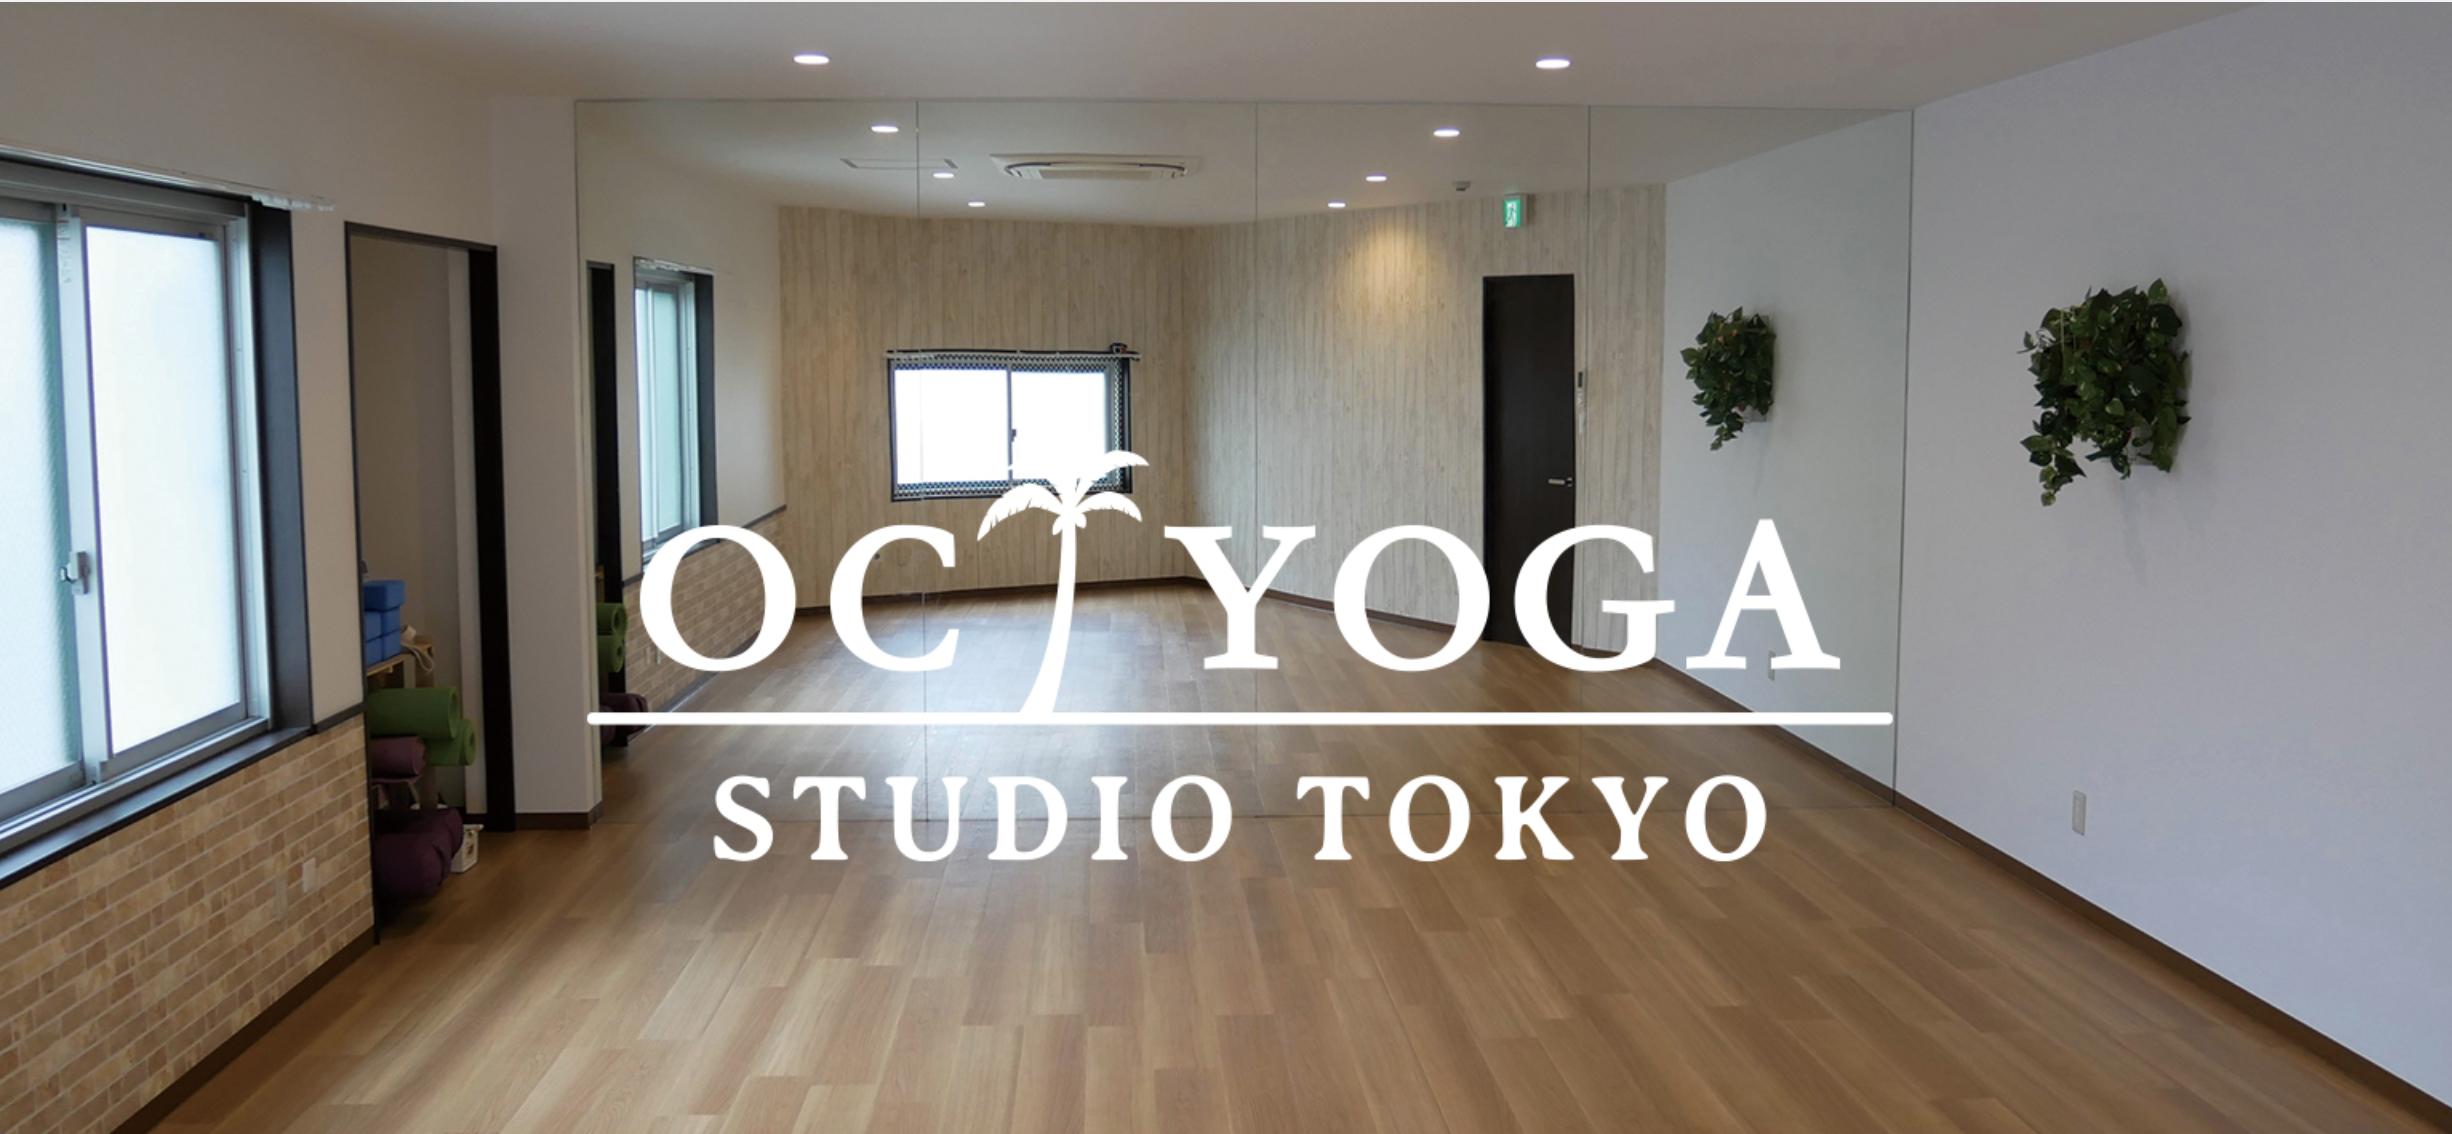 OCYOGAのスタジオ